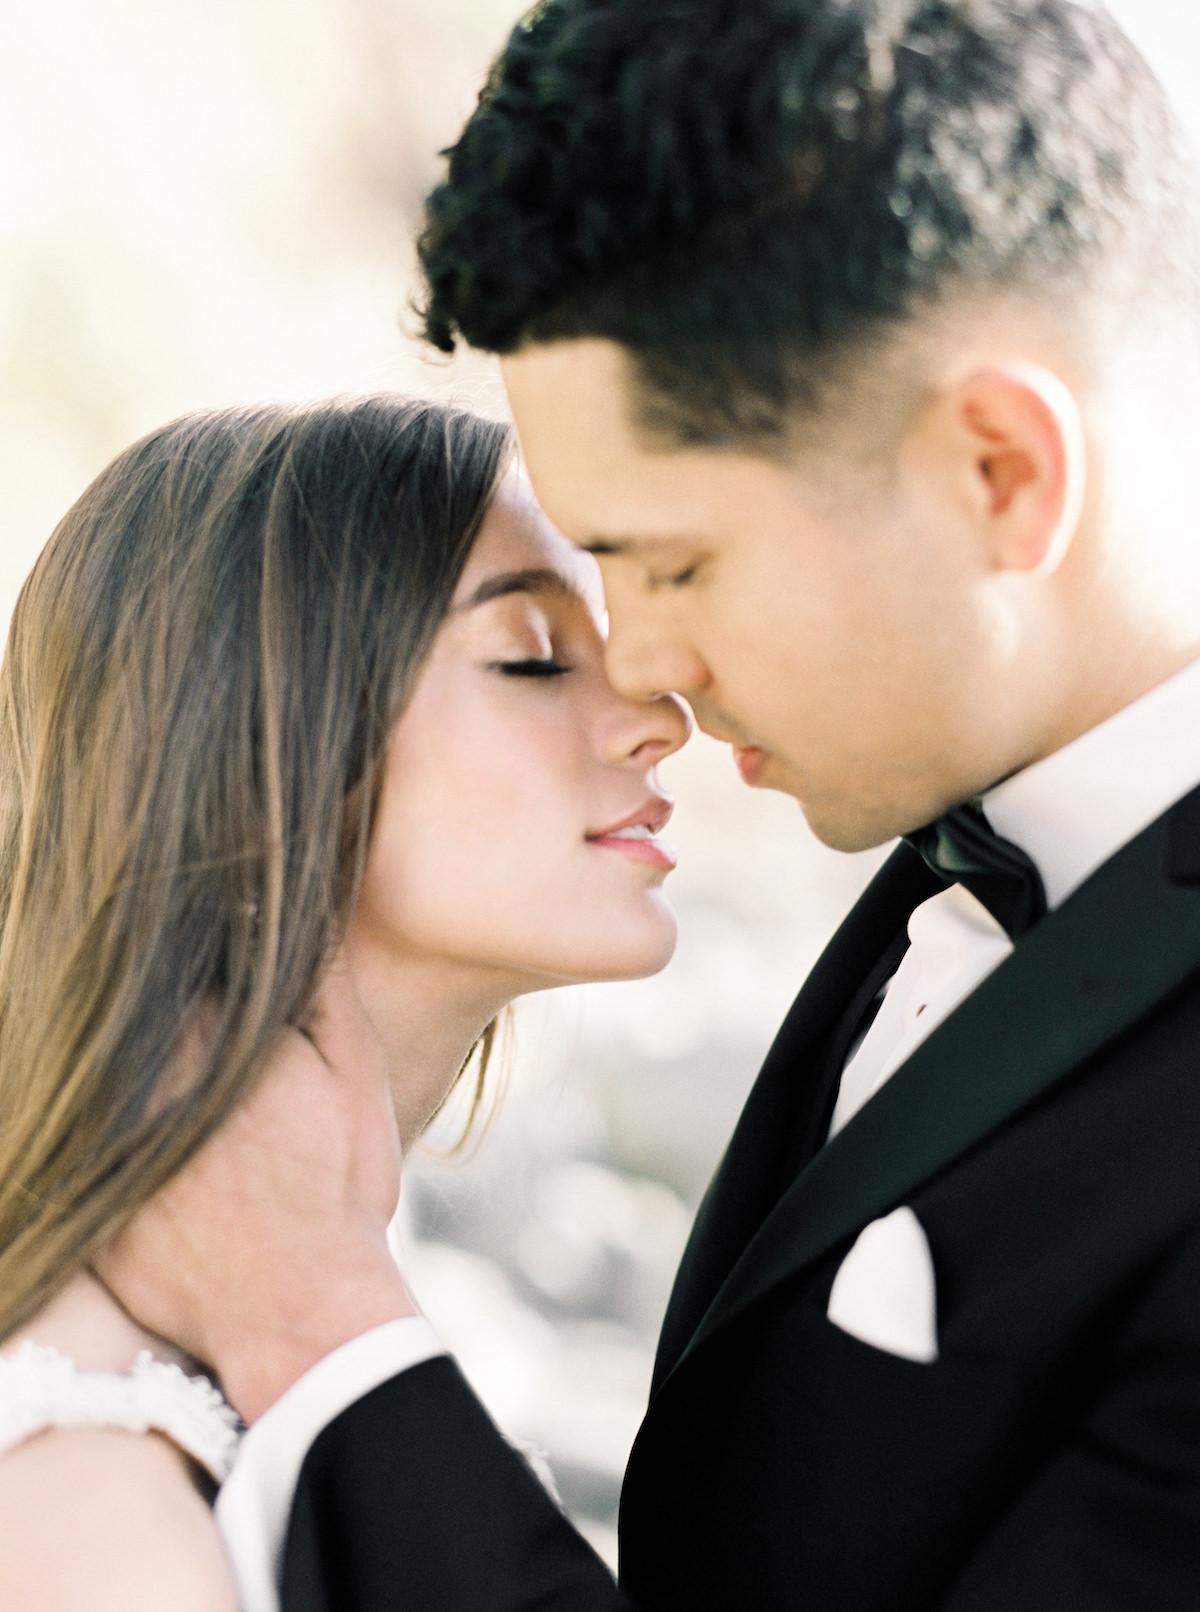 Santa-Barbara-Film-Wedding-Photography-San-Luis-Obispo-Ashley-Rae-Studio109.jpg